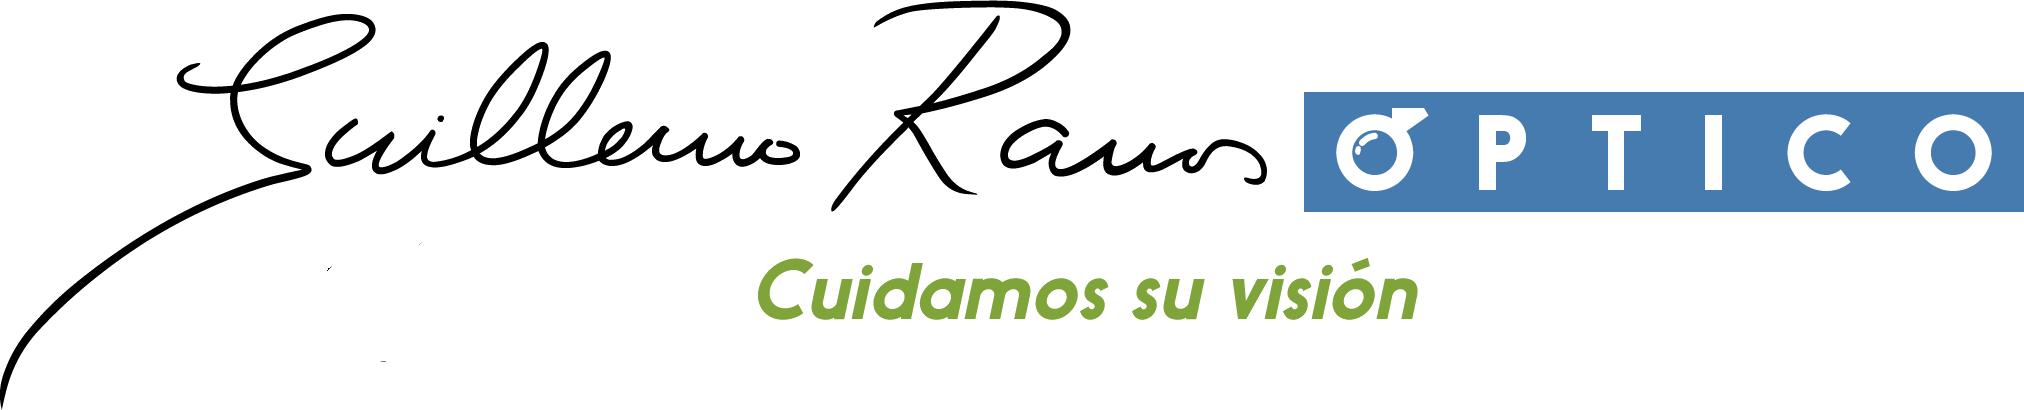 Guillermo Ramos Óptico